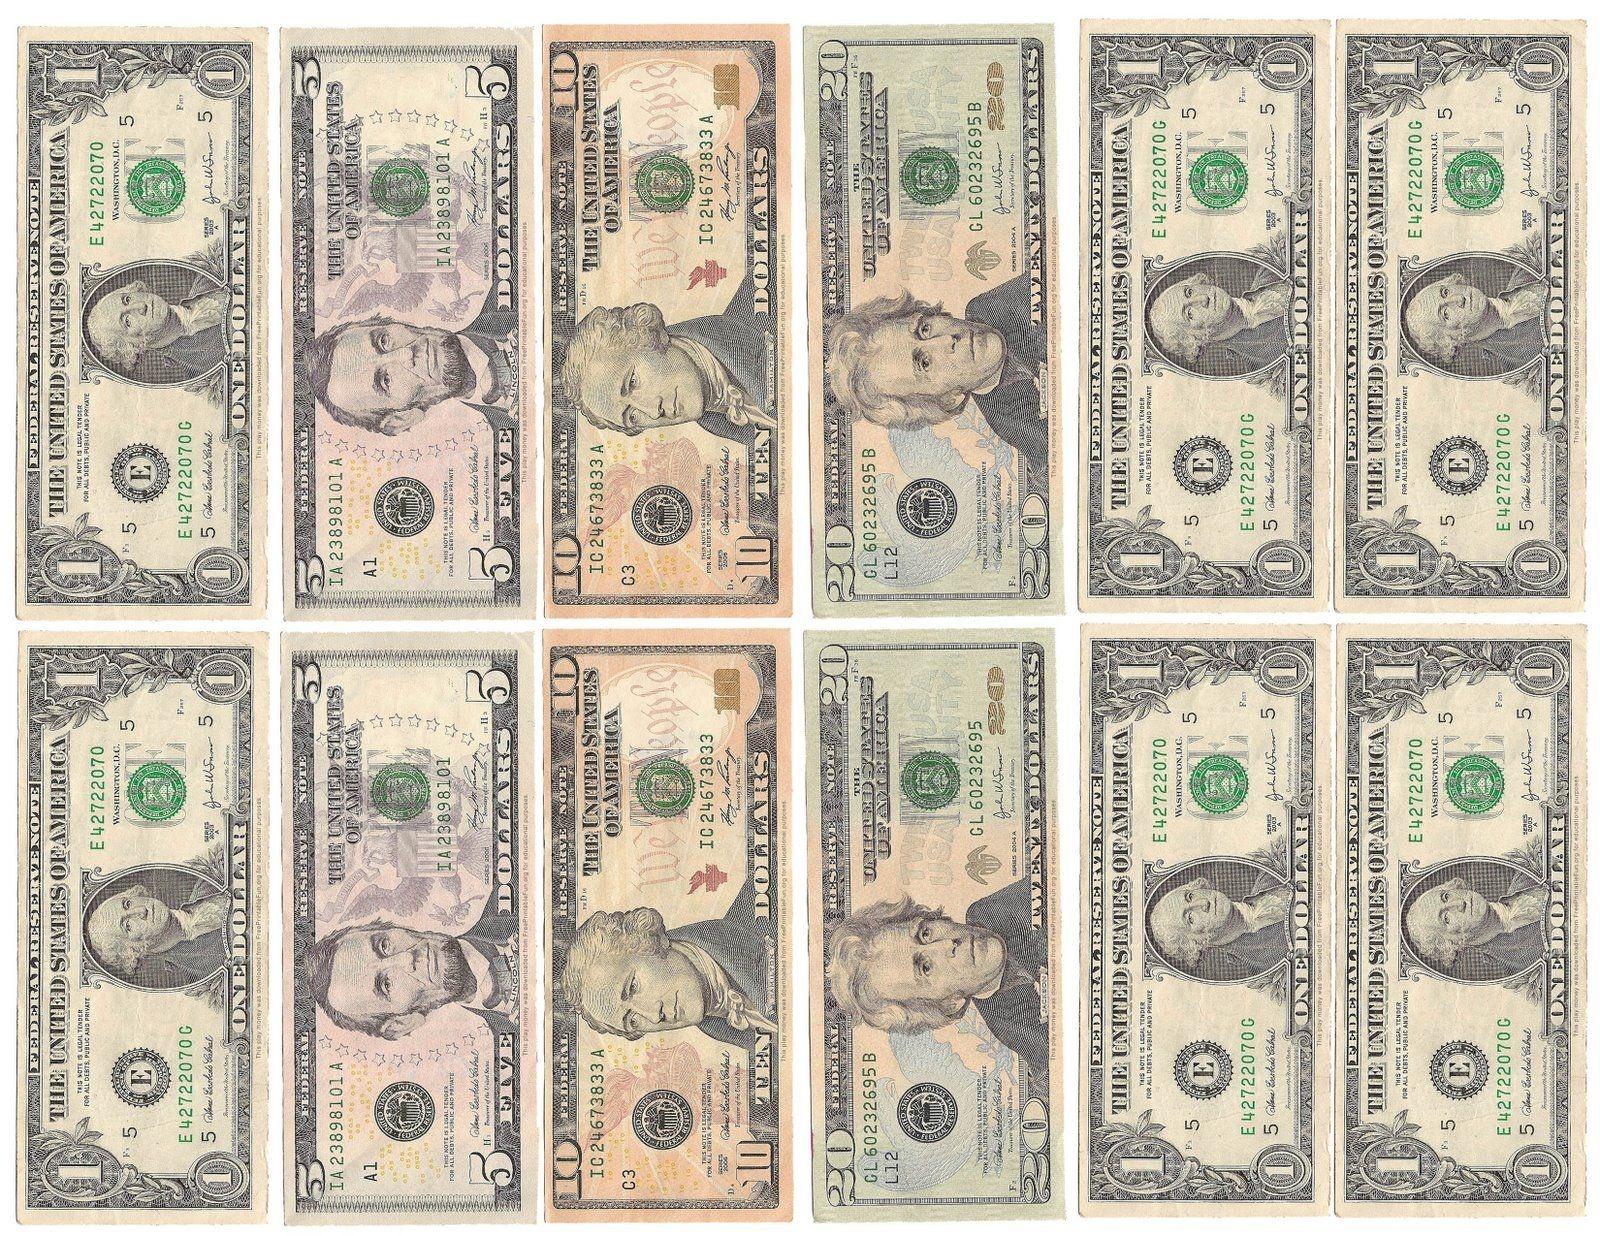 Money Money Money! | Kid's Room | Play Money Template, Printable - Free Printable Fake Money That Looks Real